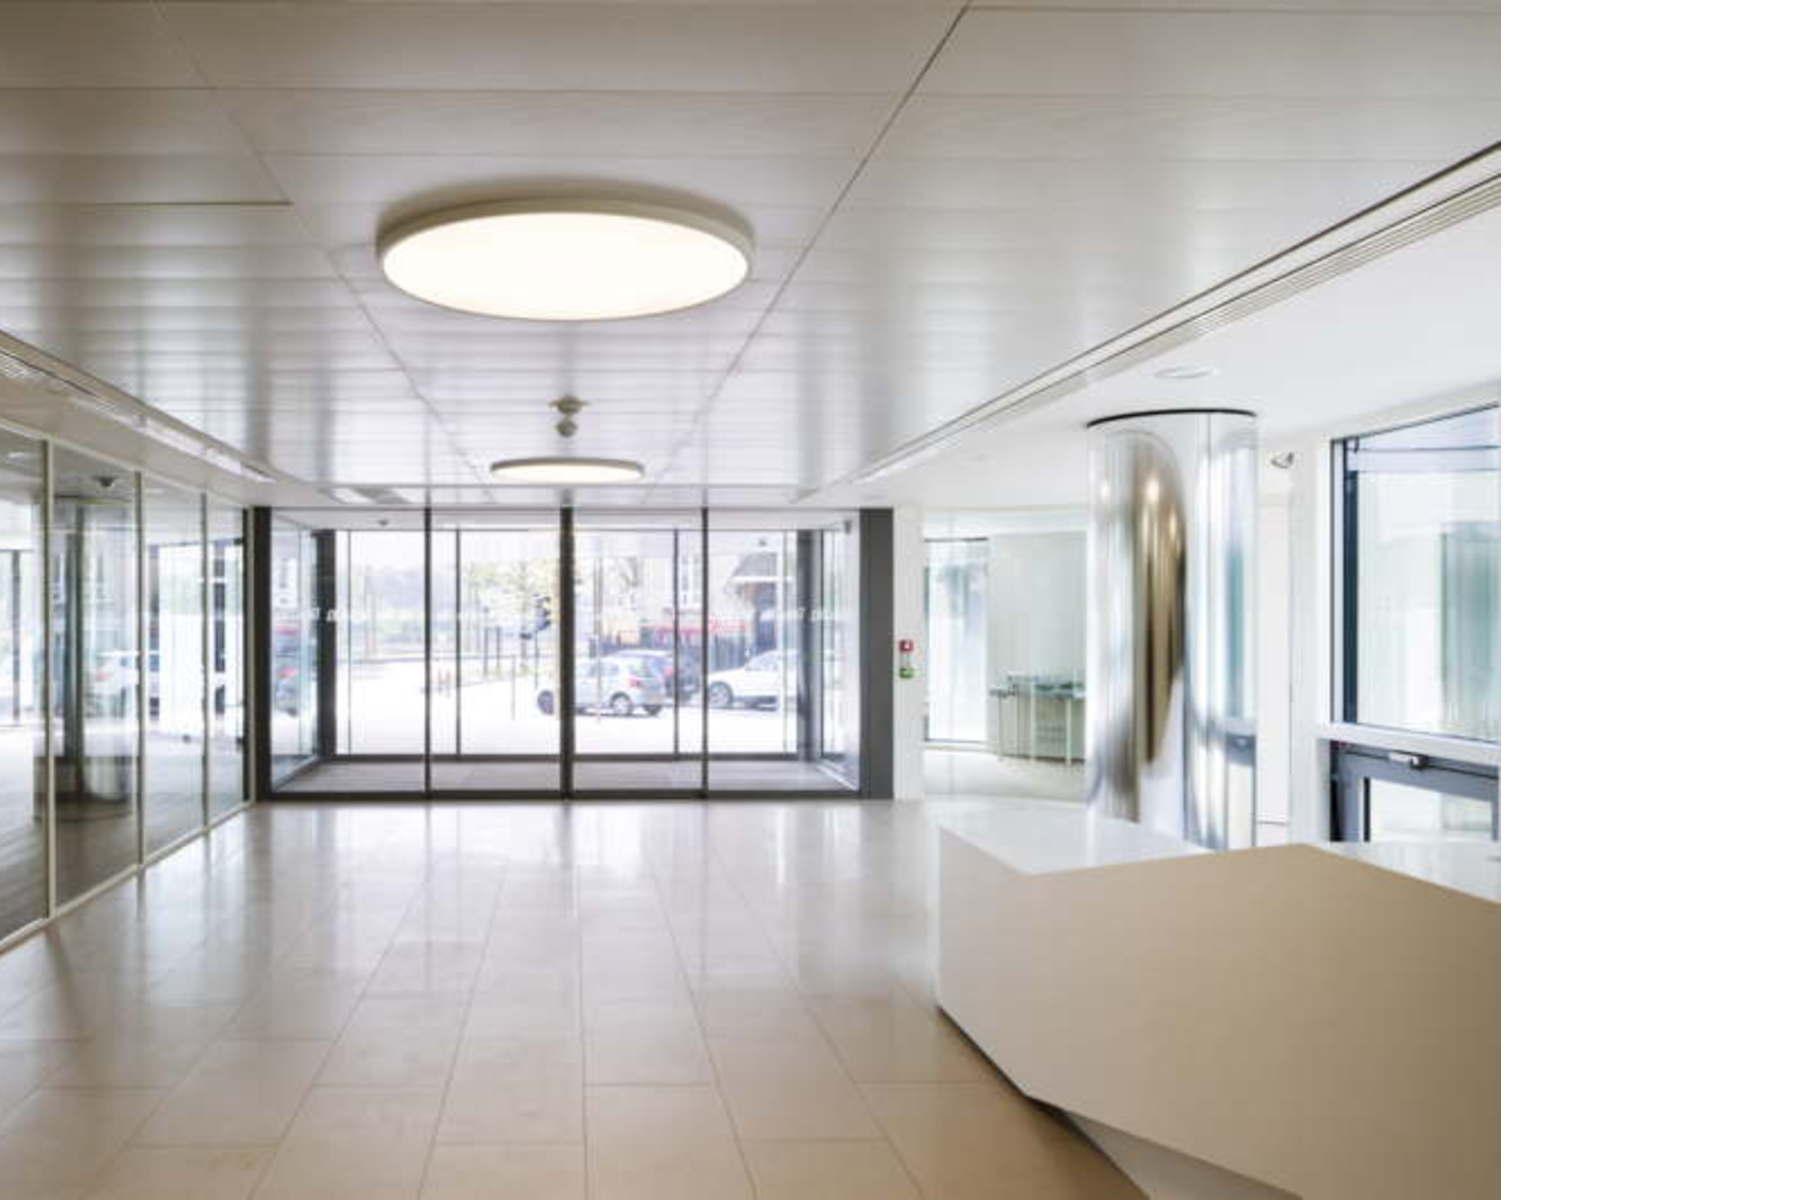 atelier zuendel cristea firmensitz pacemar in suresnes paris floornature. Black Bedroom Furniture Sets. Home Design Ideas